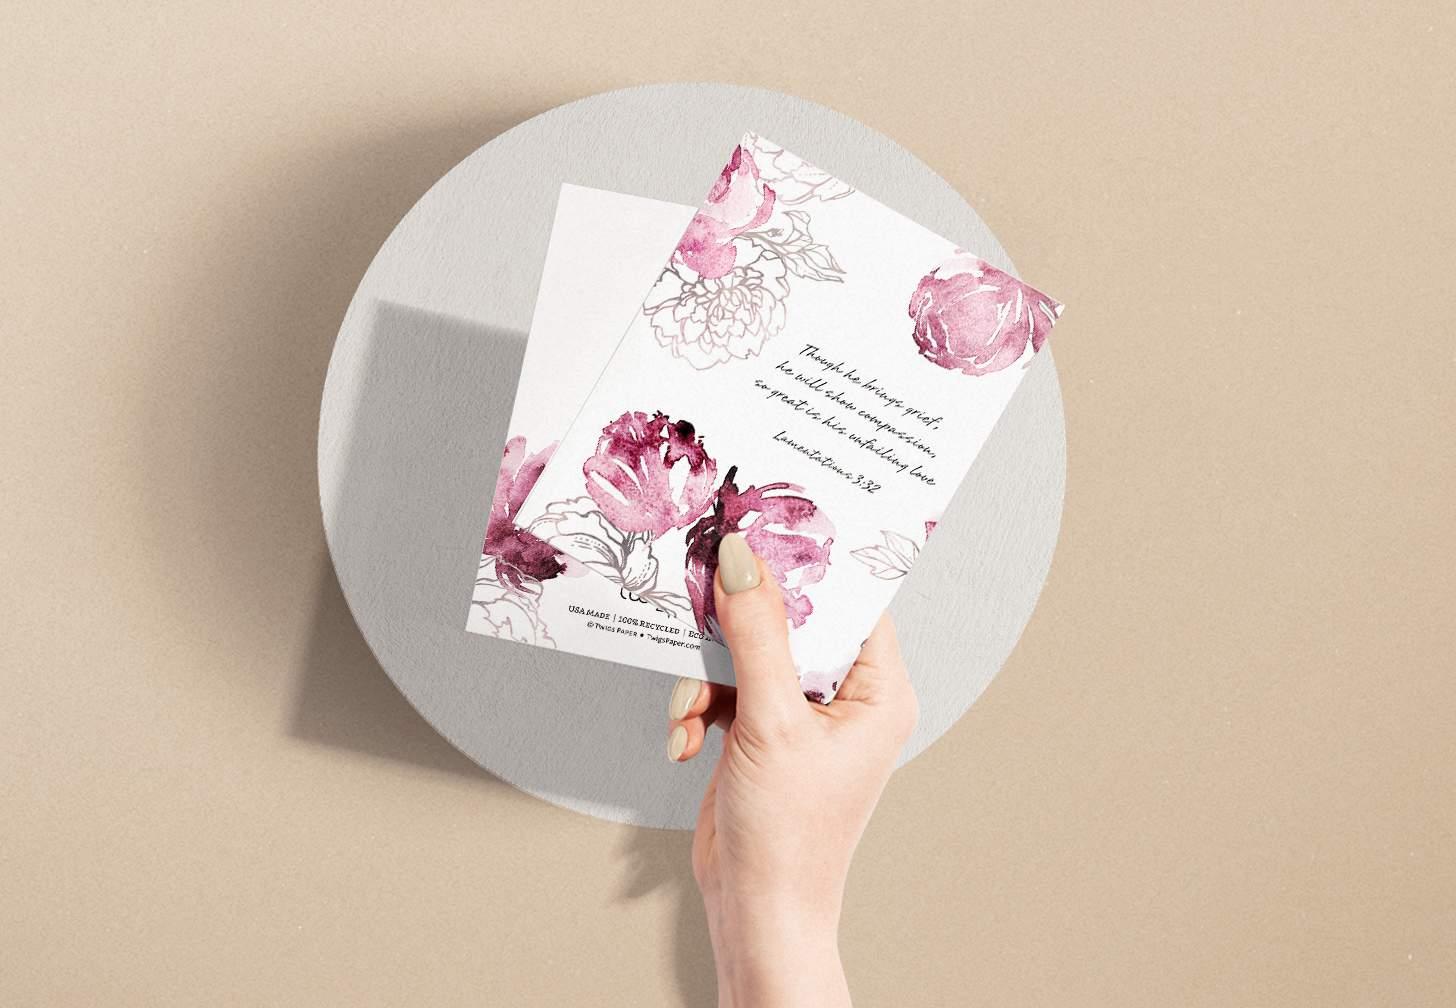 Hands holding Pink floral themed sympathy design